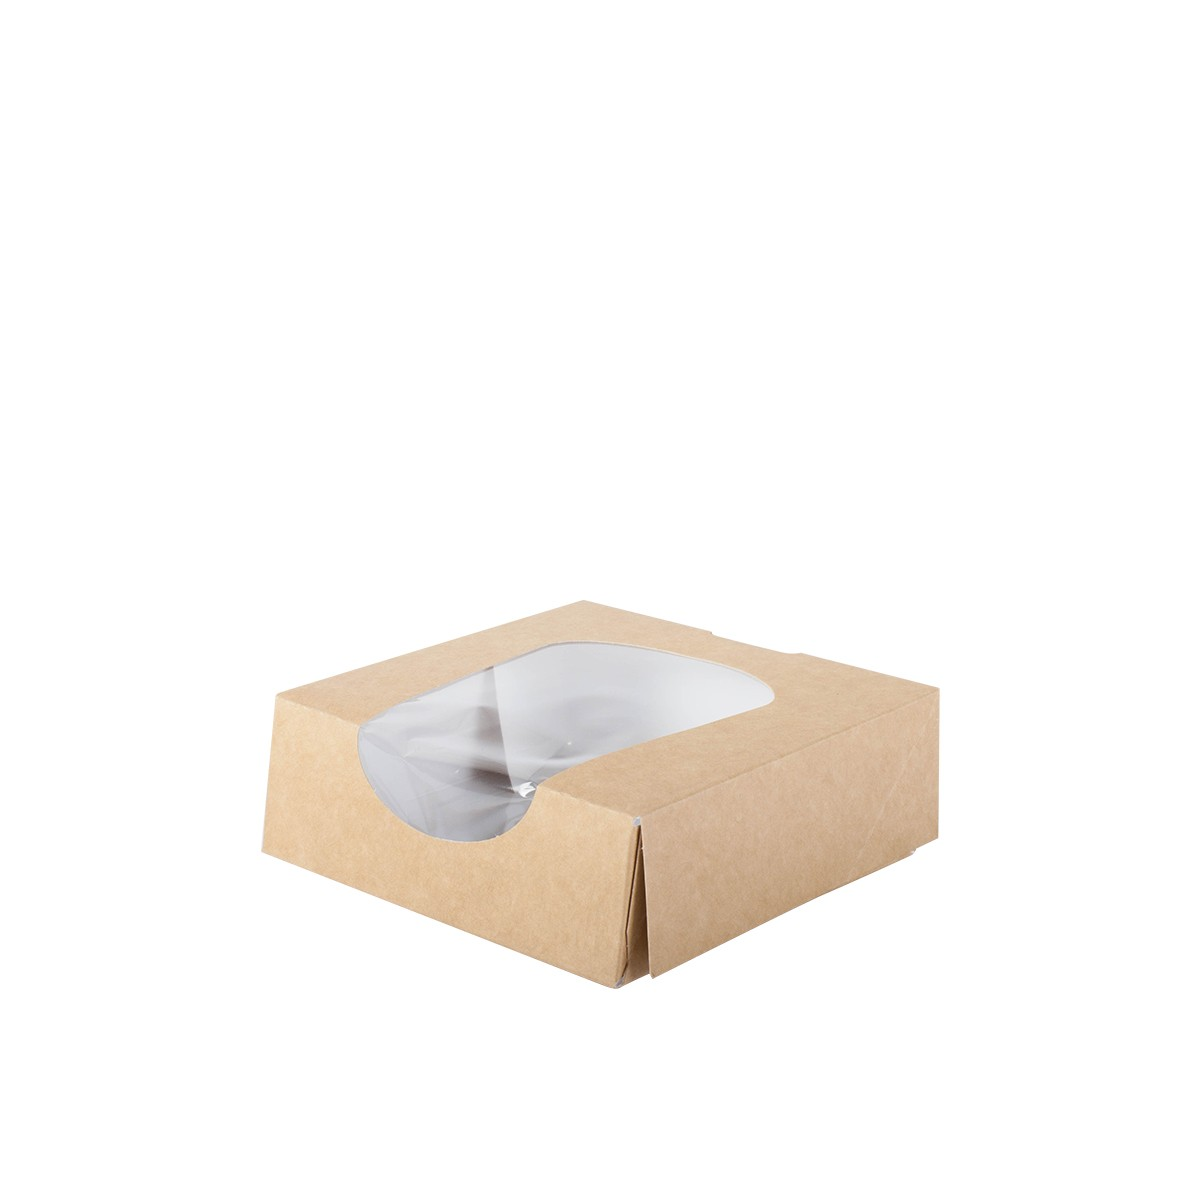 boite patissiere en carton avec fenetre